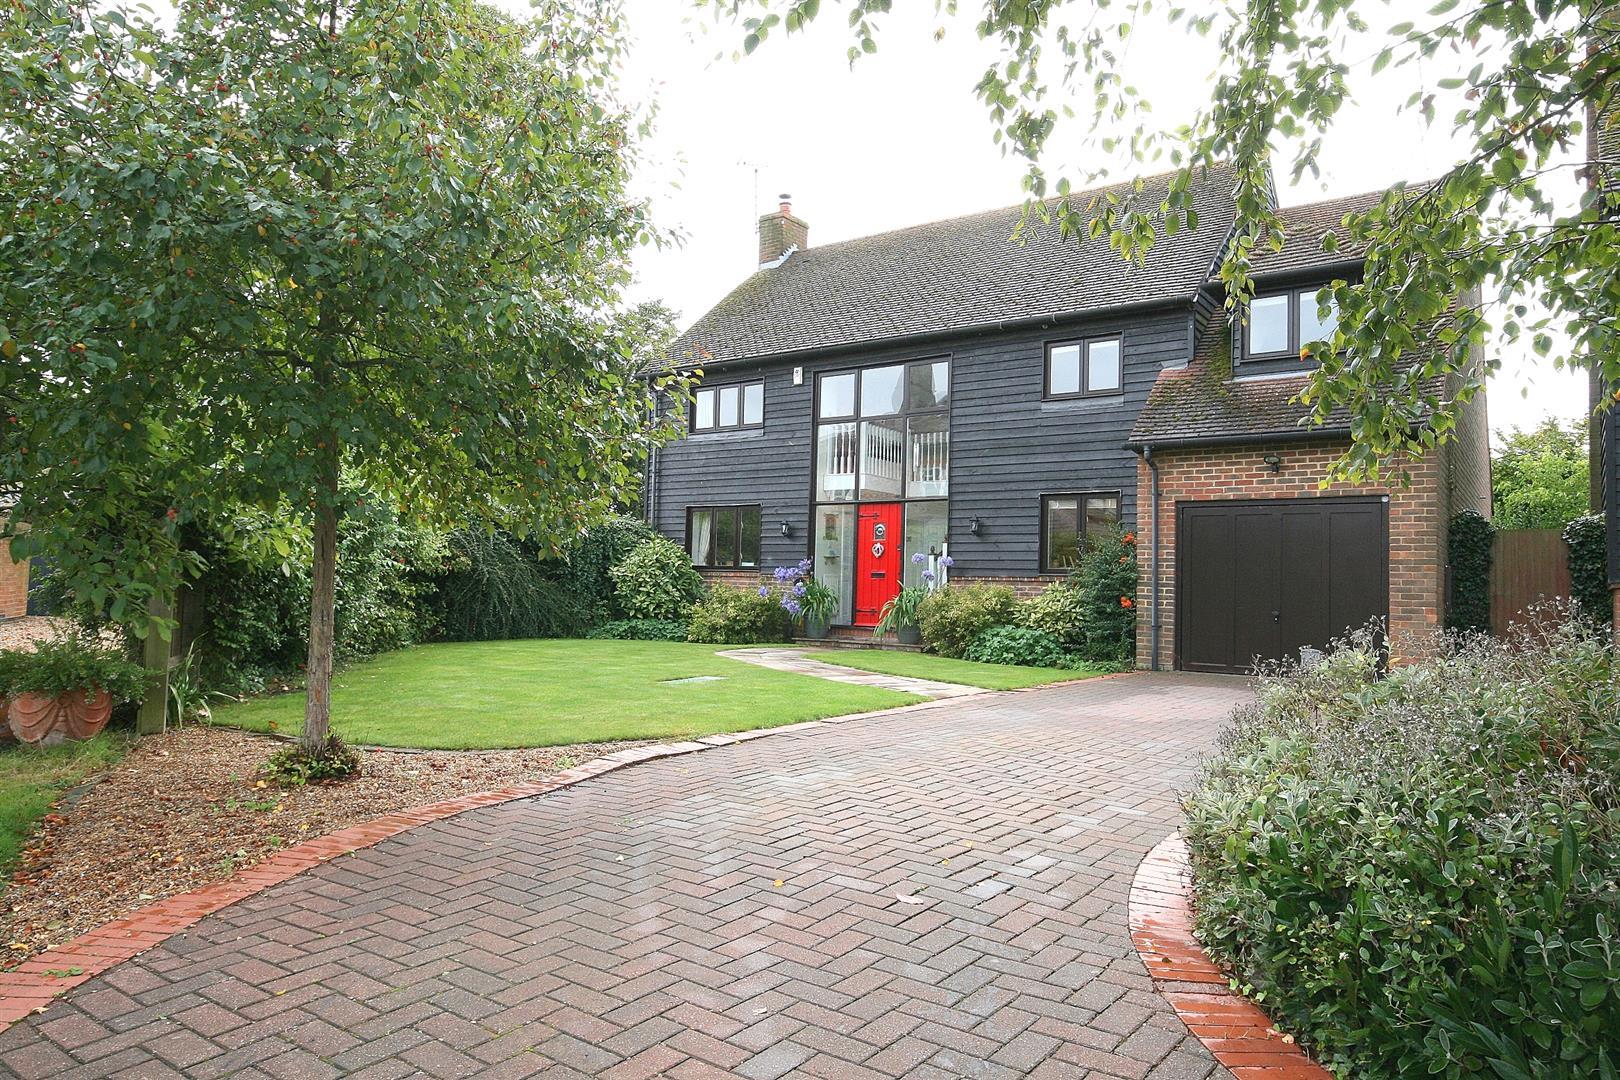 4 Bedrooms Detached House for sale in Bury Farm Close, Slapton, Bucks.